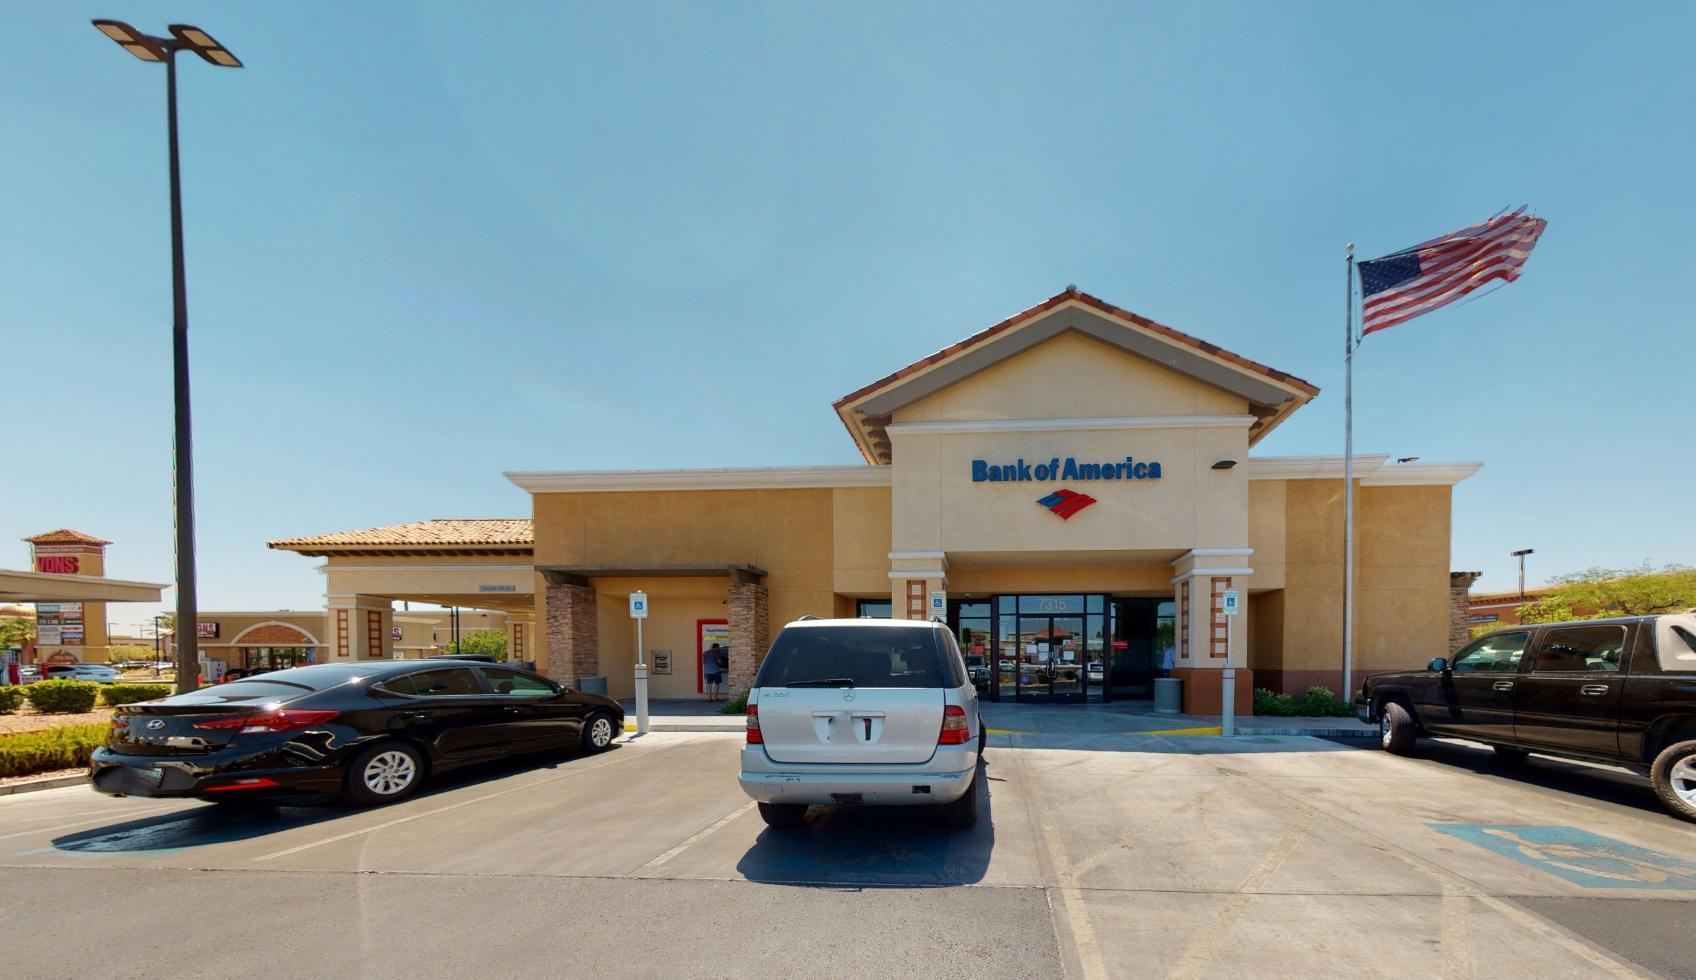 Bank of America financial center with drive-thru ATM   7315 S Durango Dr, Las Vegas, NV 89113